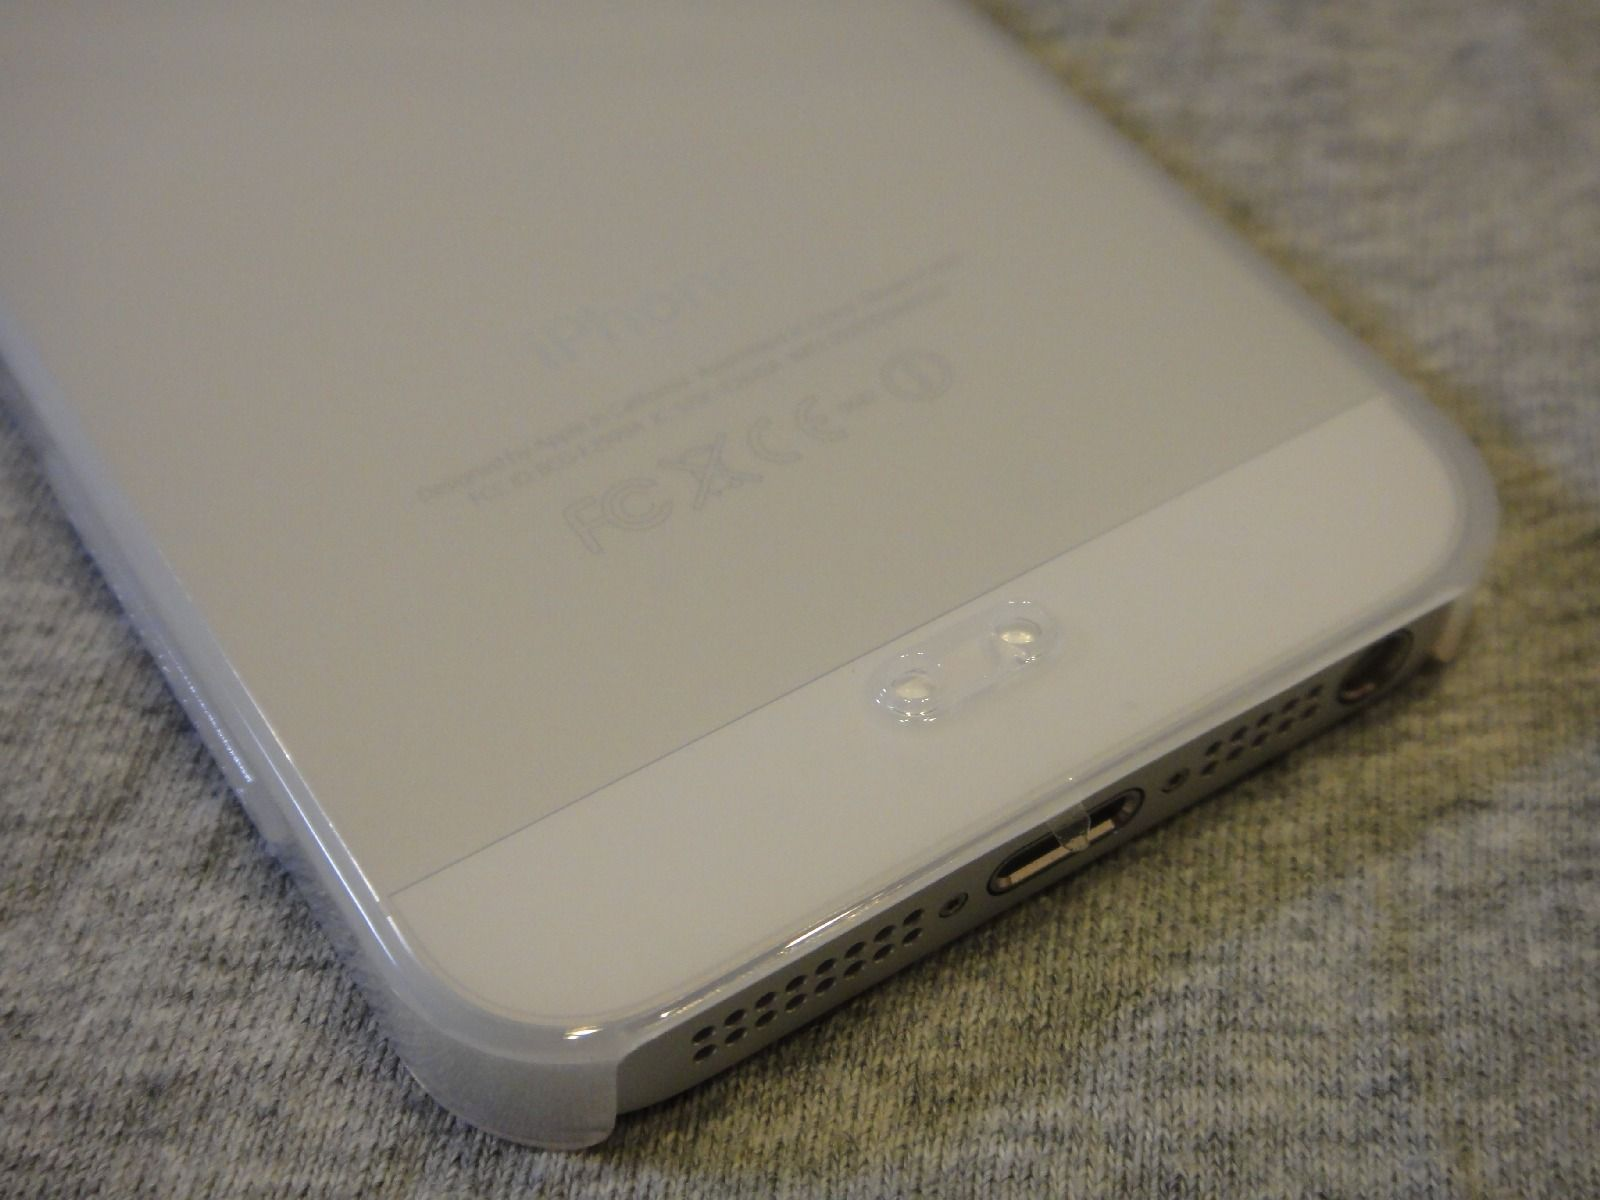 iPhone5_021.jpg